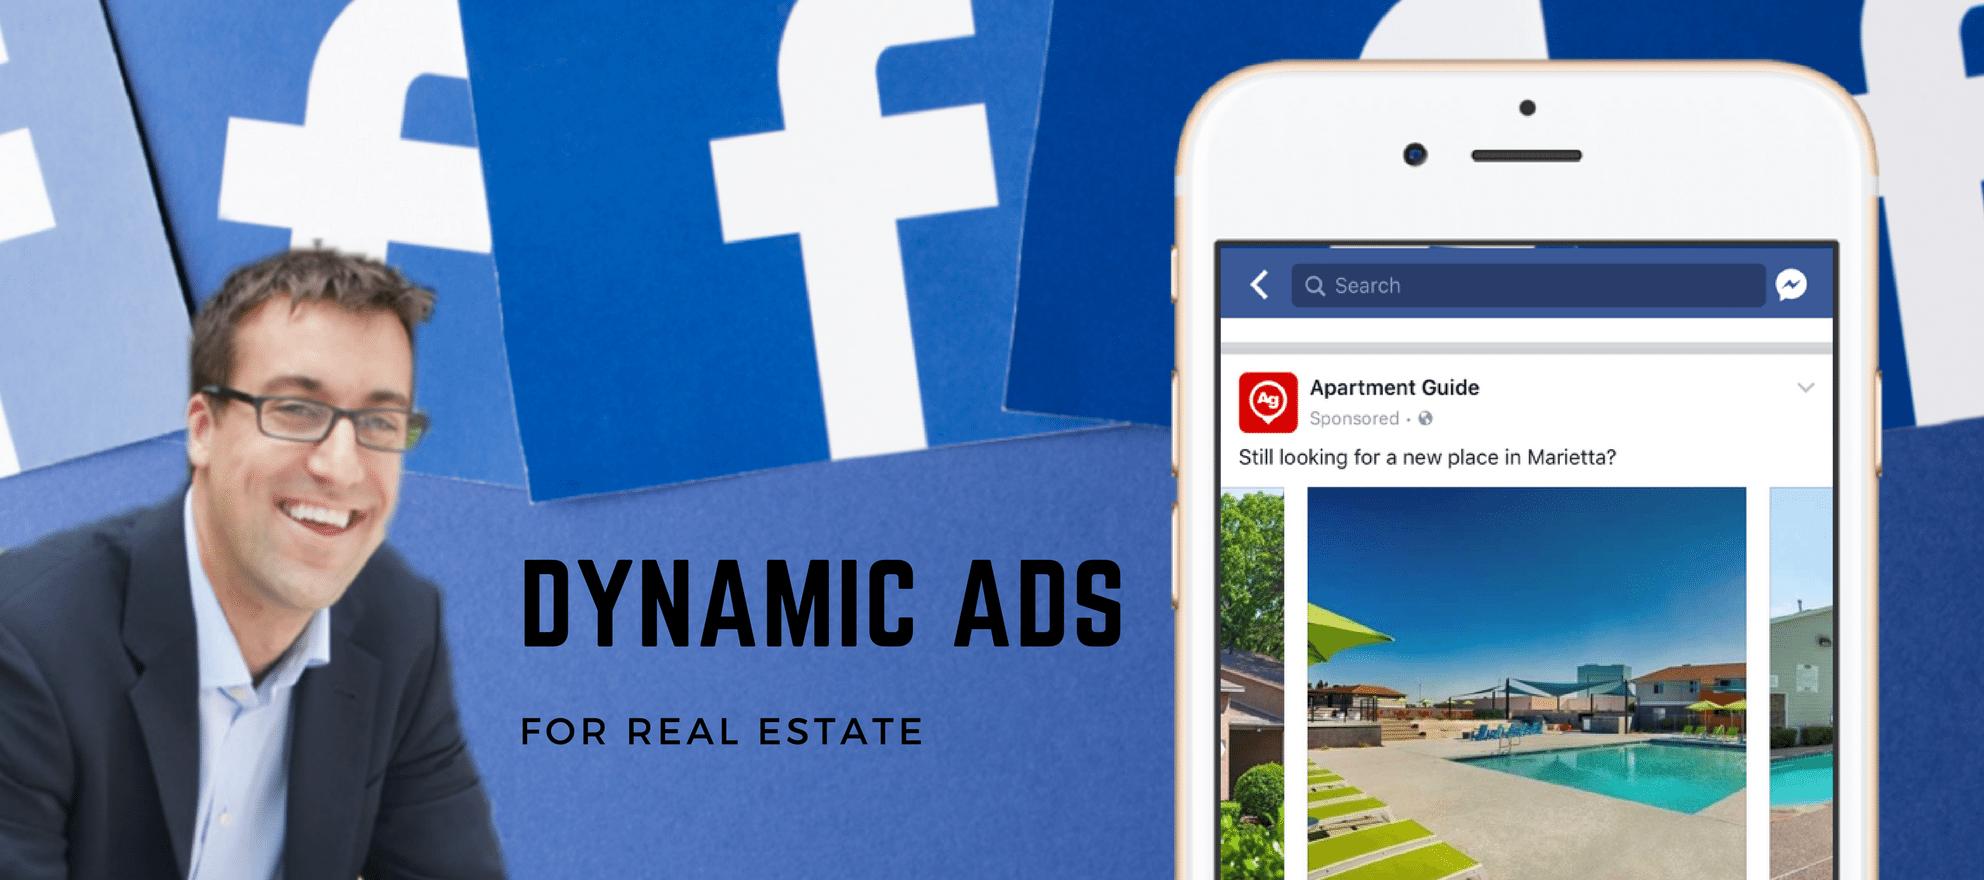 facebook dynamic ads for real estate